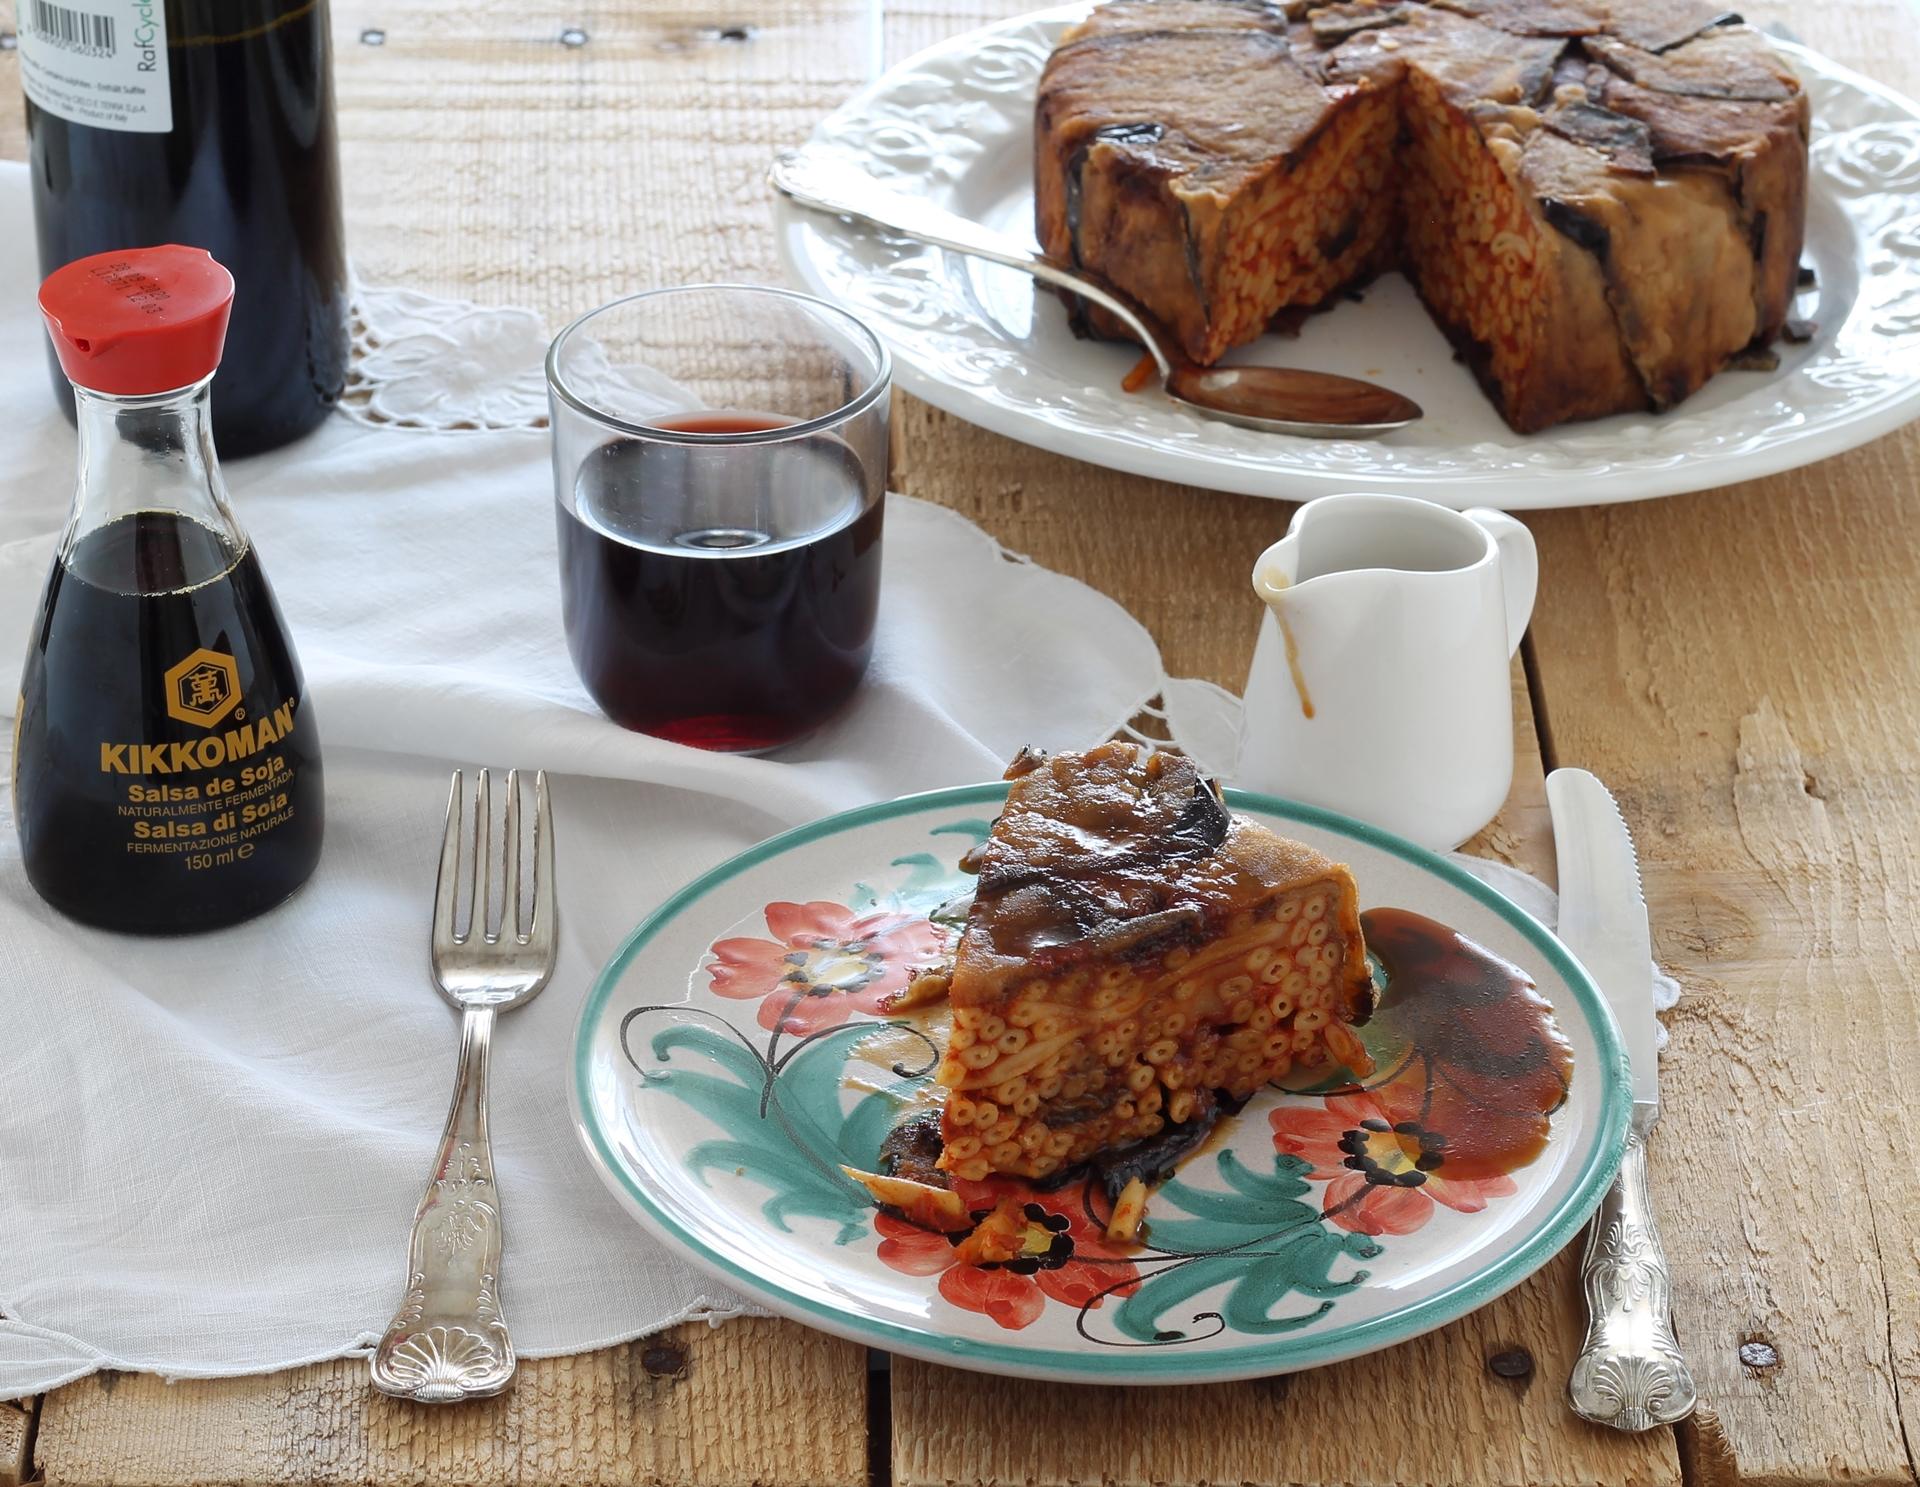 Timbale de bucatini à la sicilienne sans gluten- La Cassata Celiaca